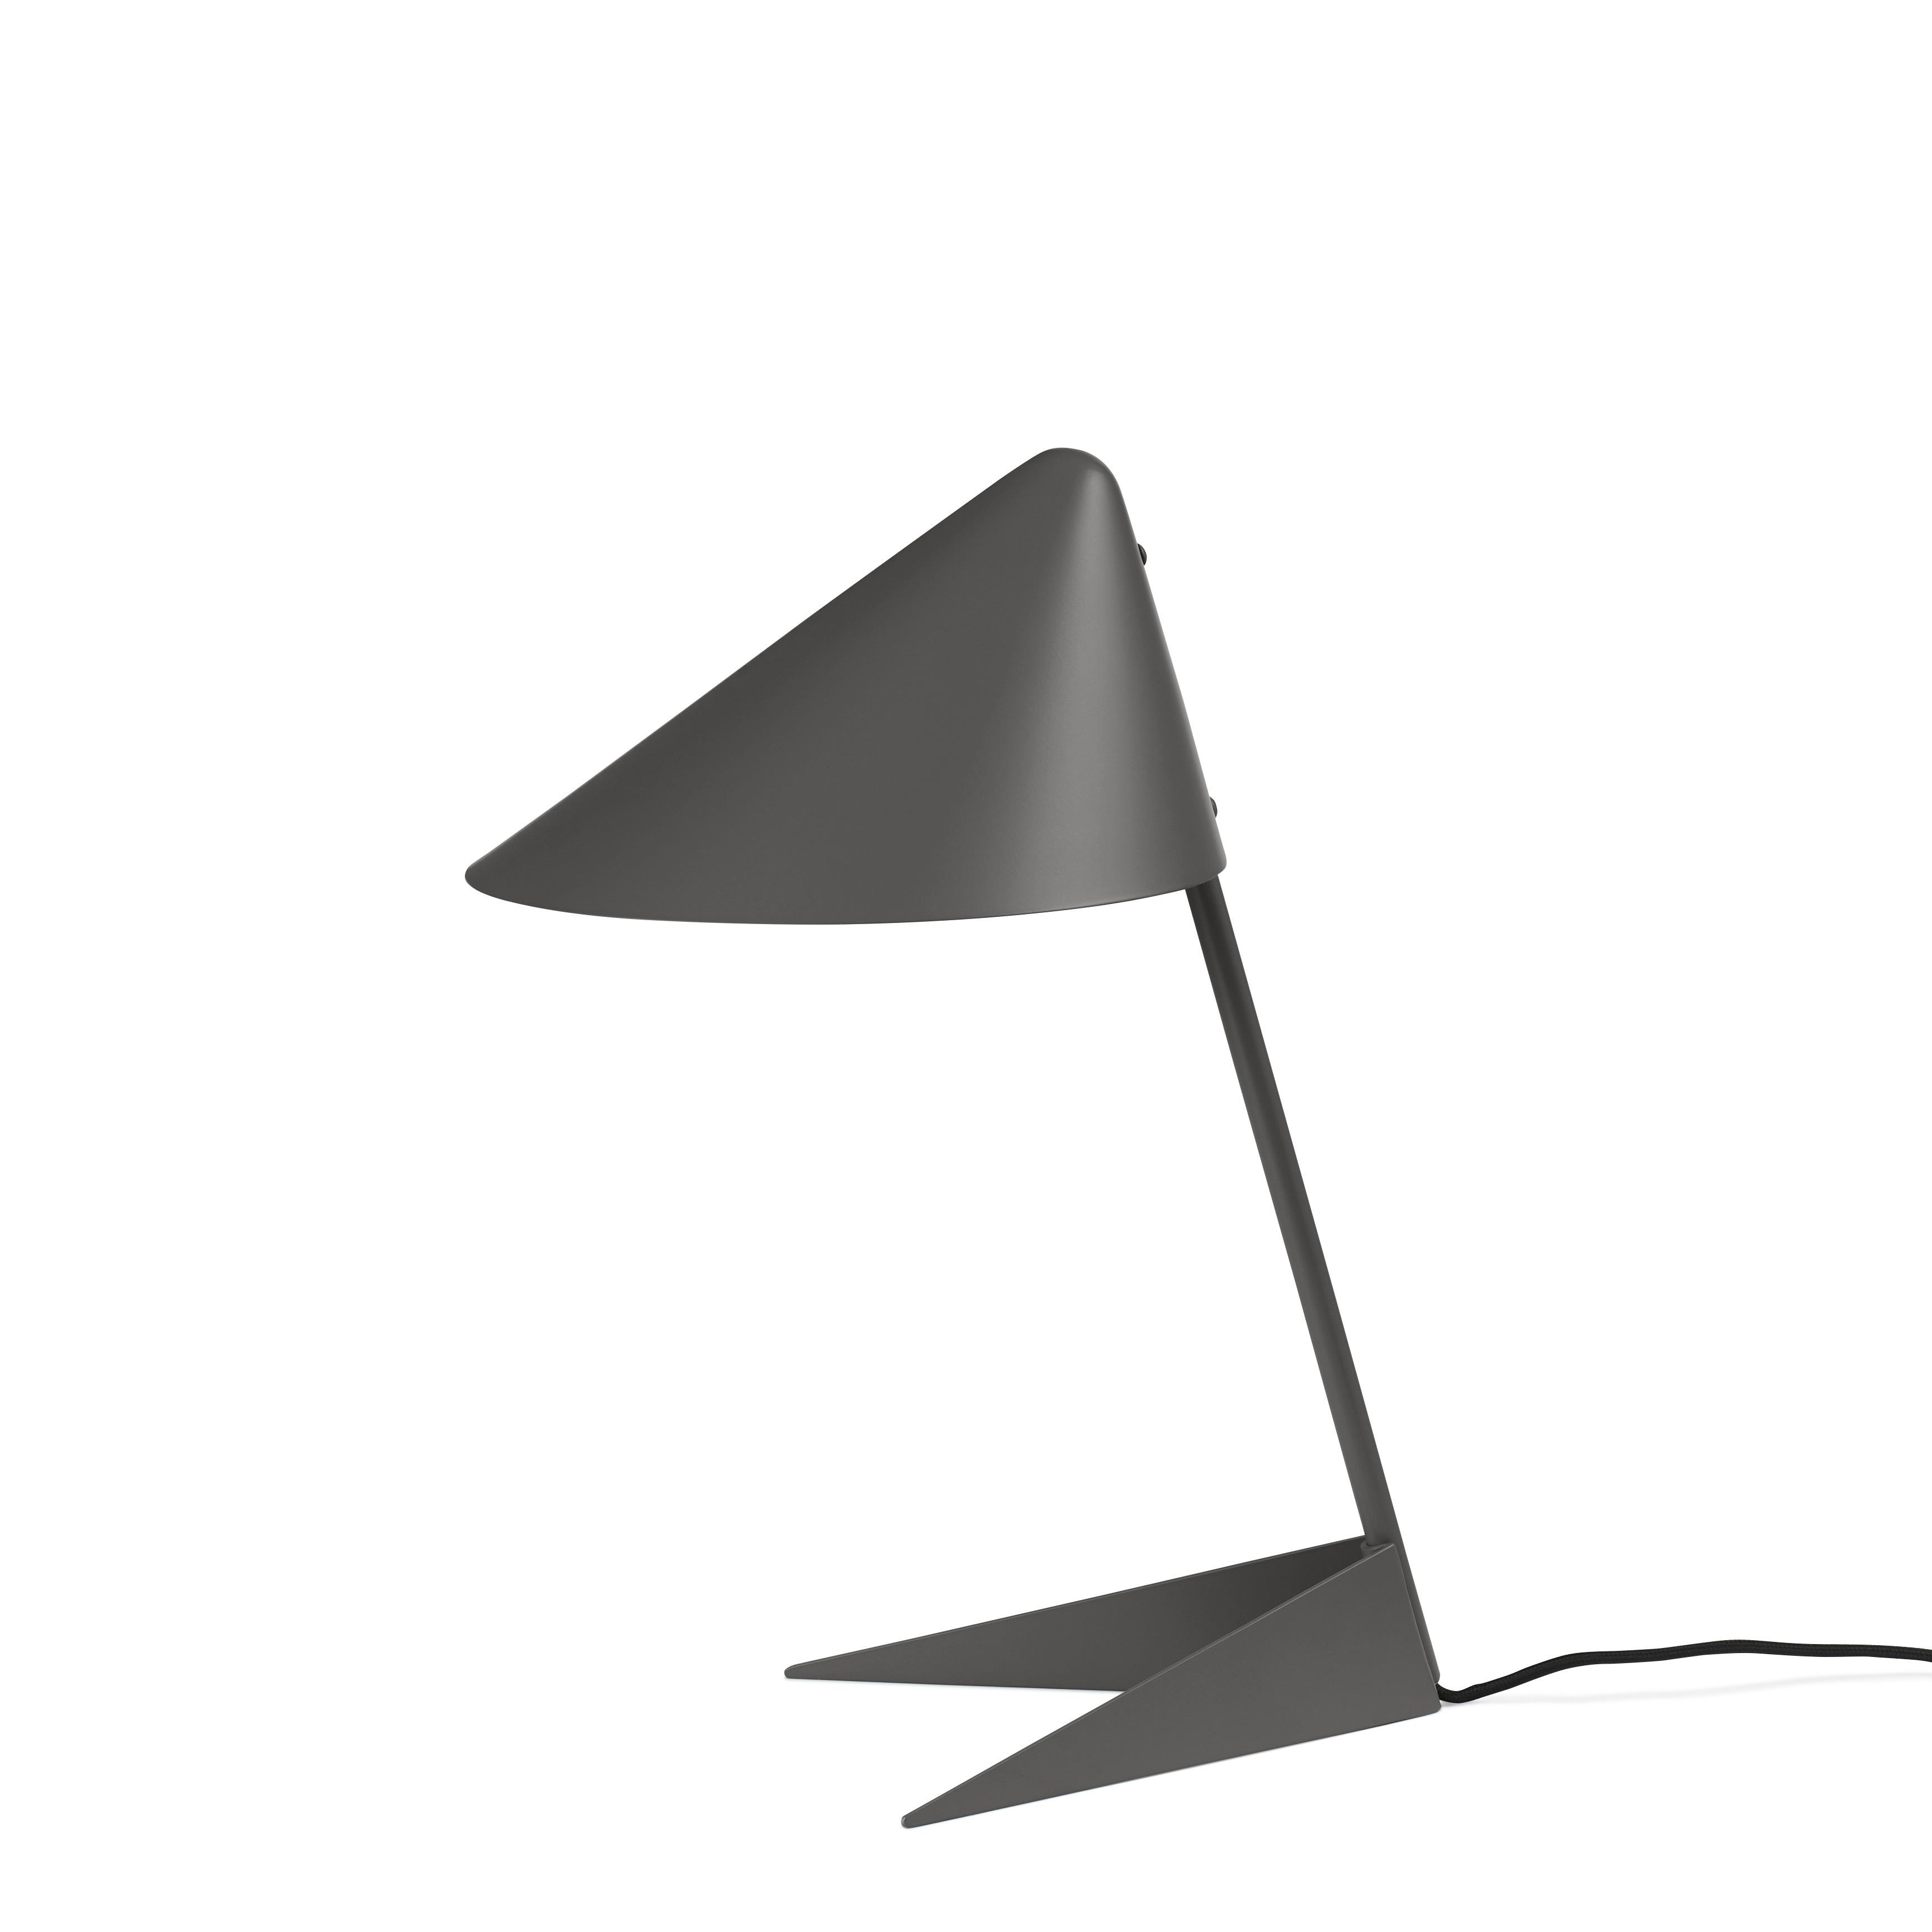 Ambience bordslampa charcoal